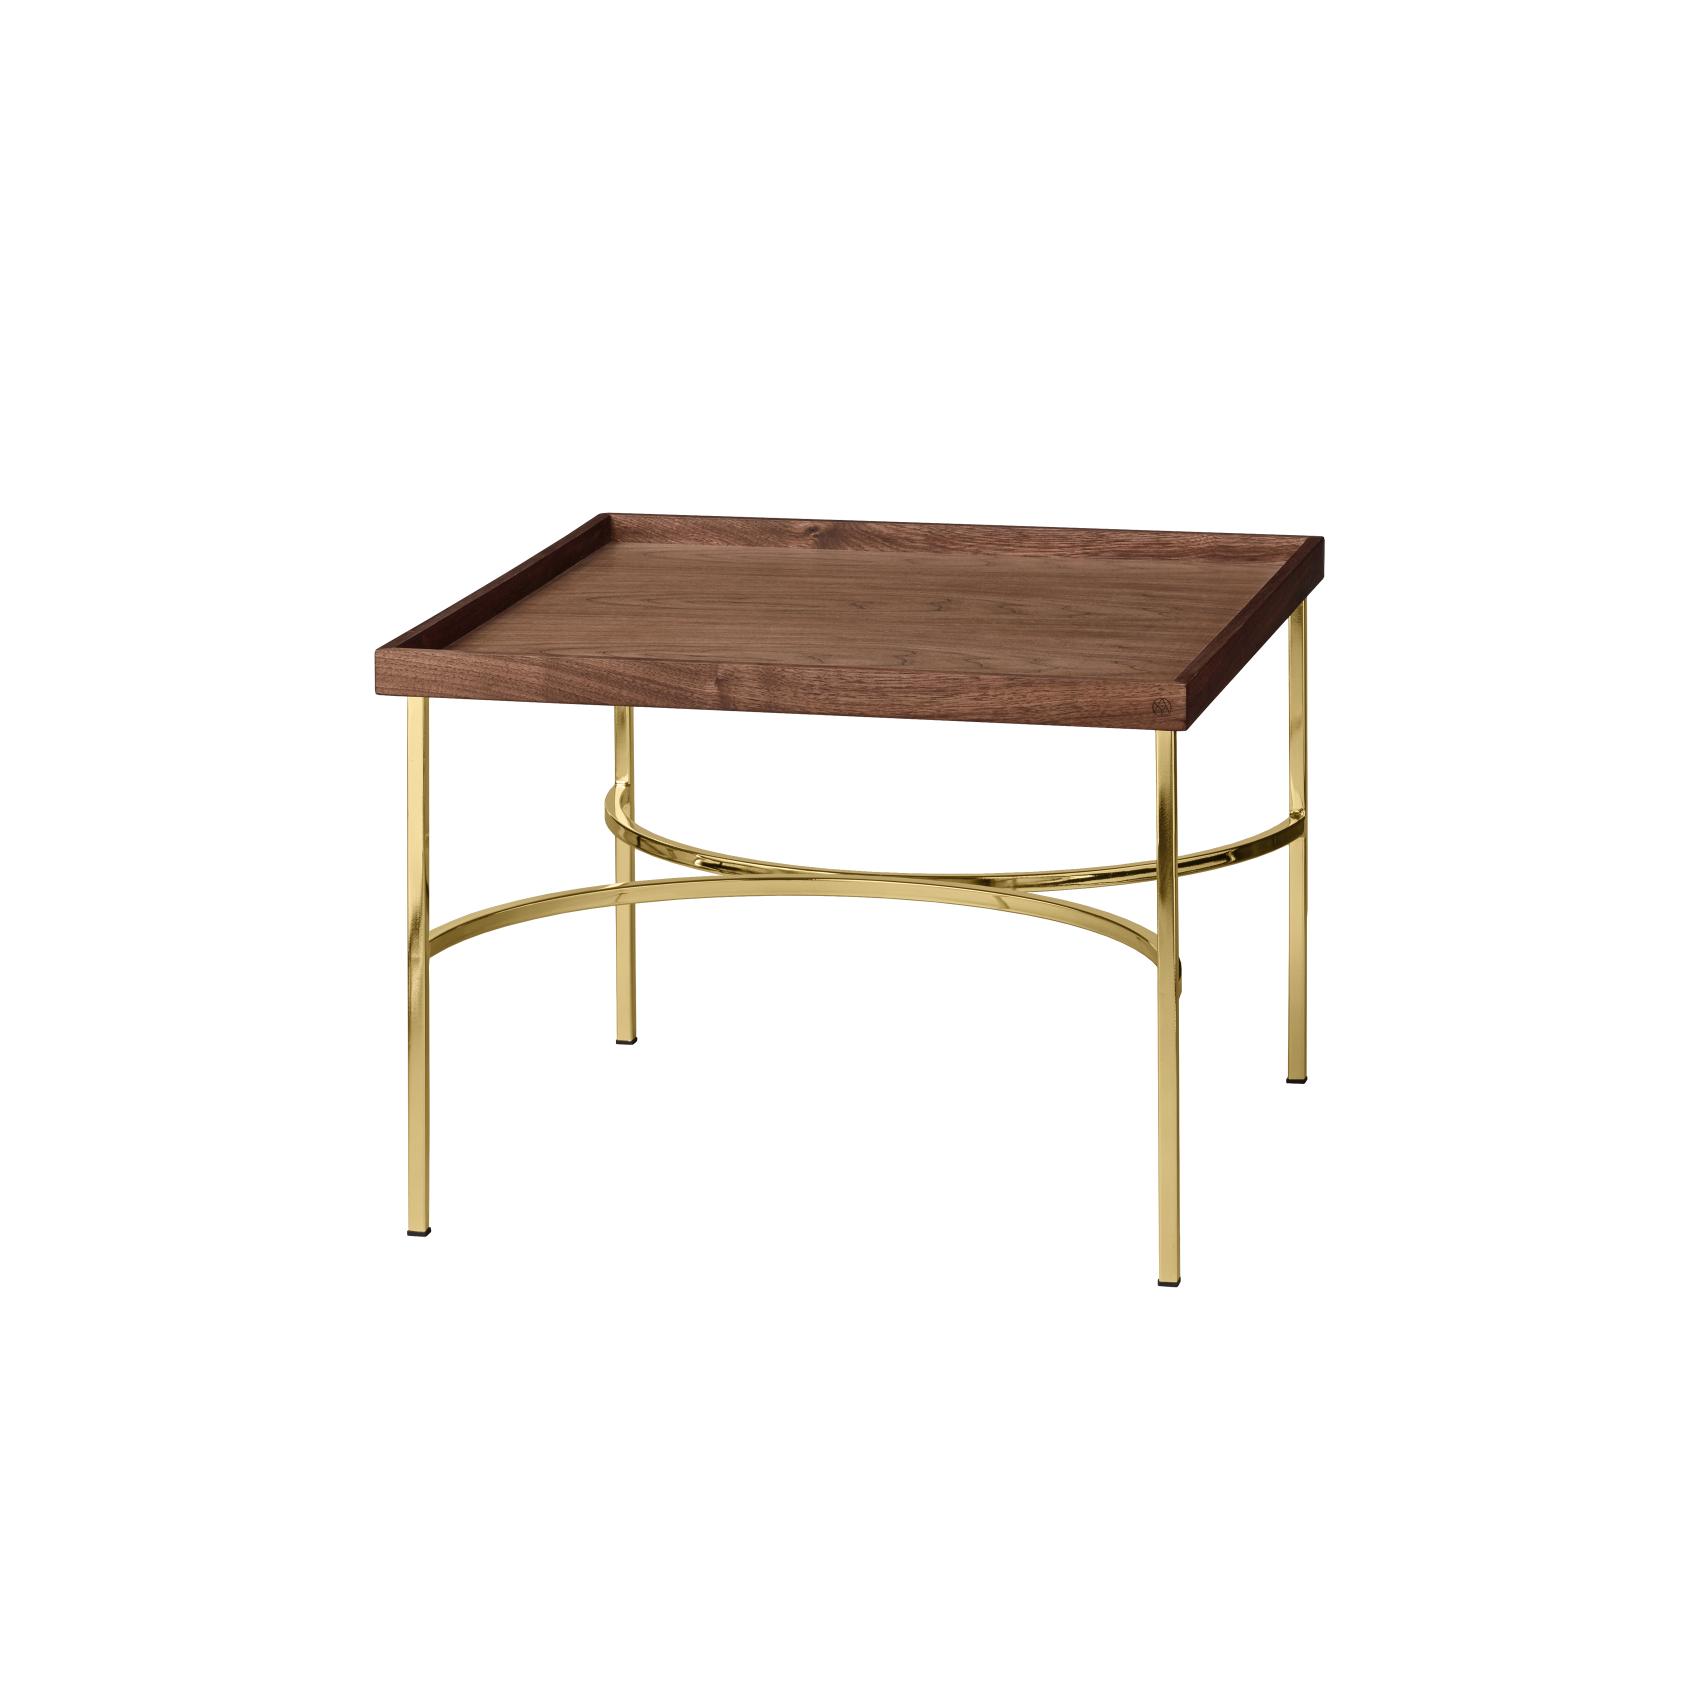 Bord UNITY table valnöt/ guld, AYTM